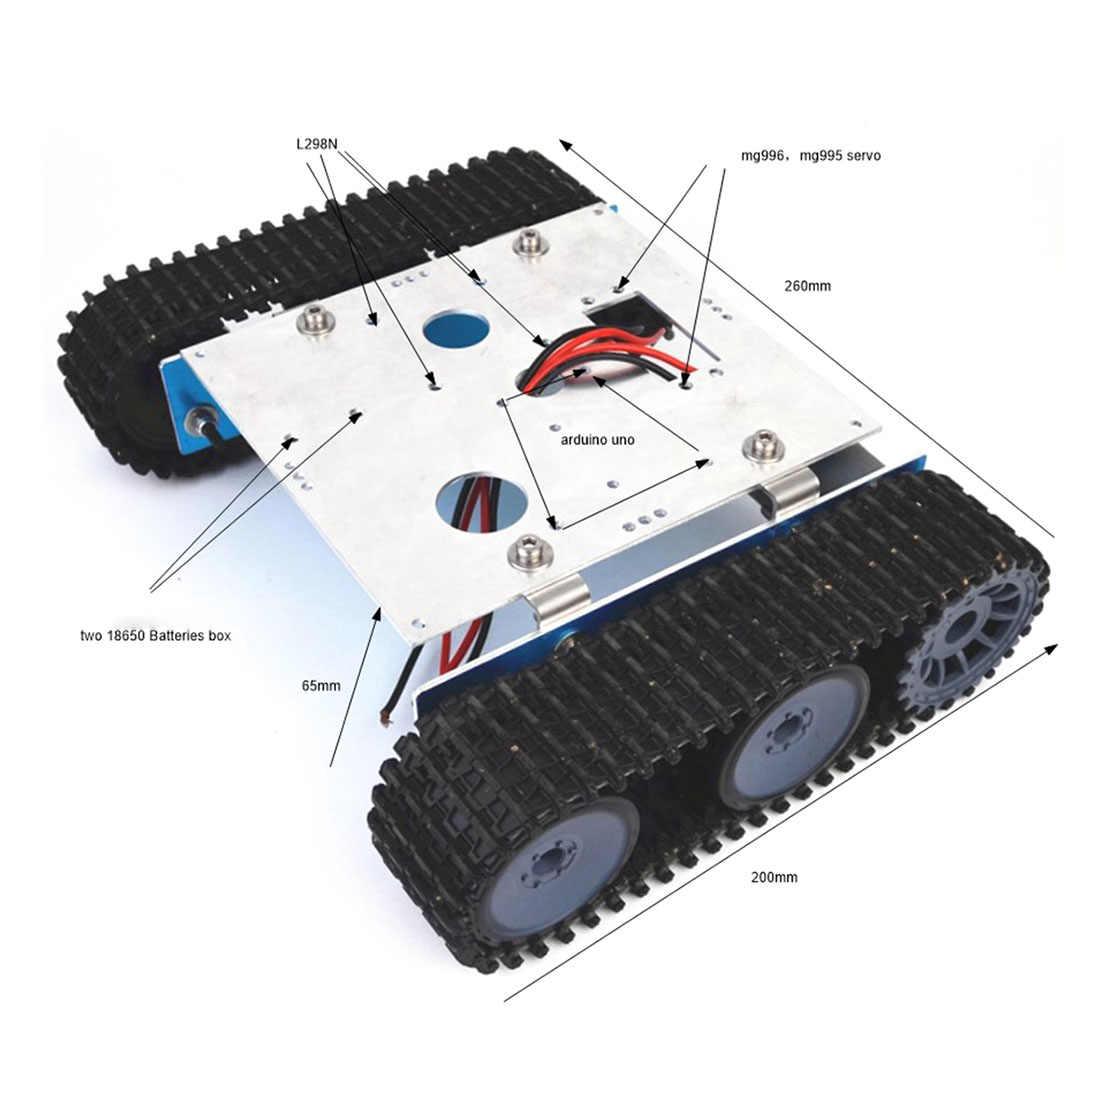 DIY ถังอลูมิเนียมหุ่นยนต์ Caterpillar รถแพลตฟอร์มแชสซีชุดชุดสำหรับ Arduino เด็ก birthdaty ของขวัญ